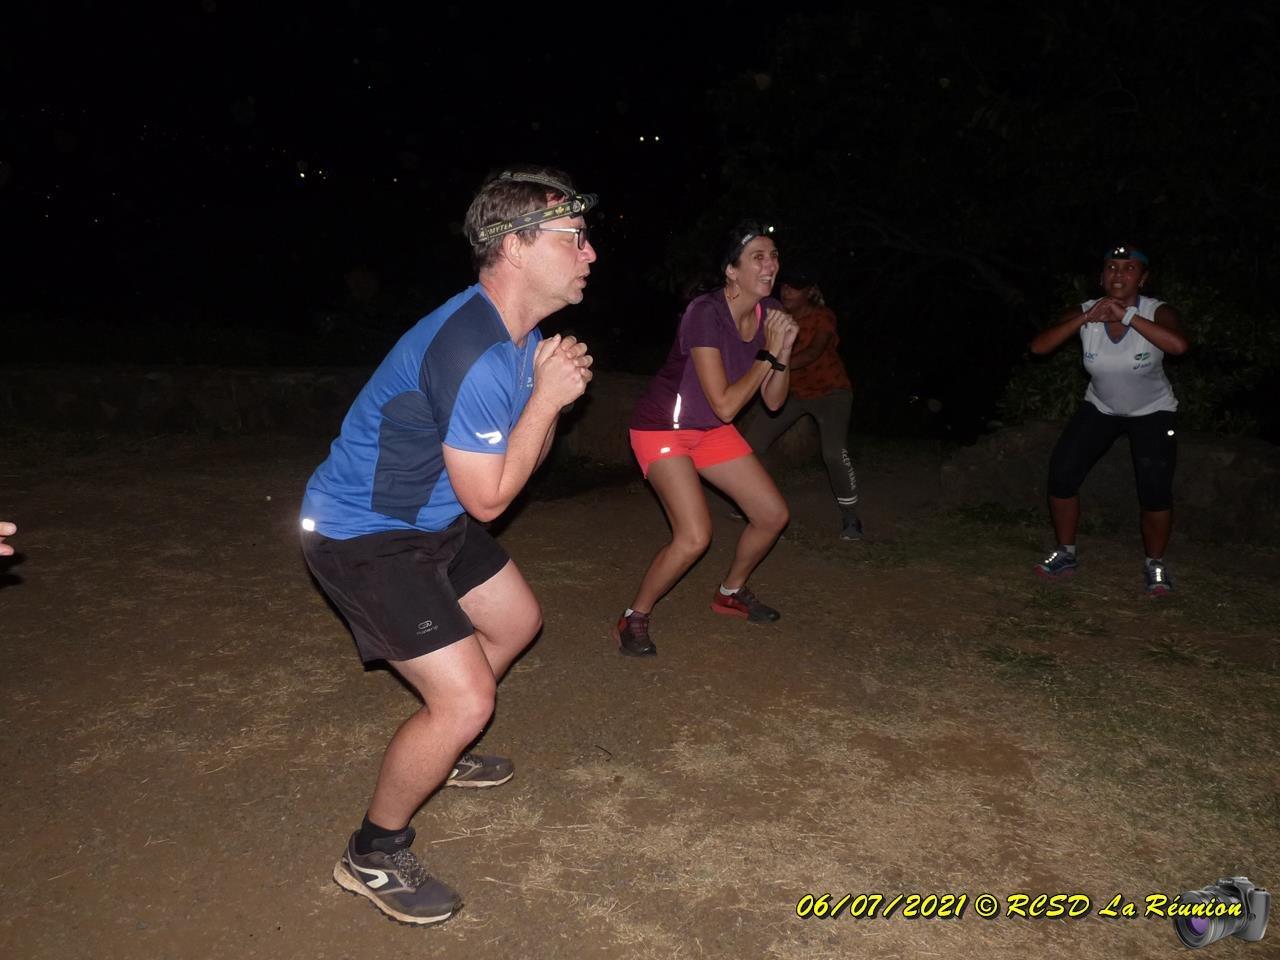 20210706 Entrain Trail Trinité 030